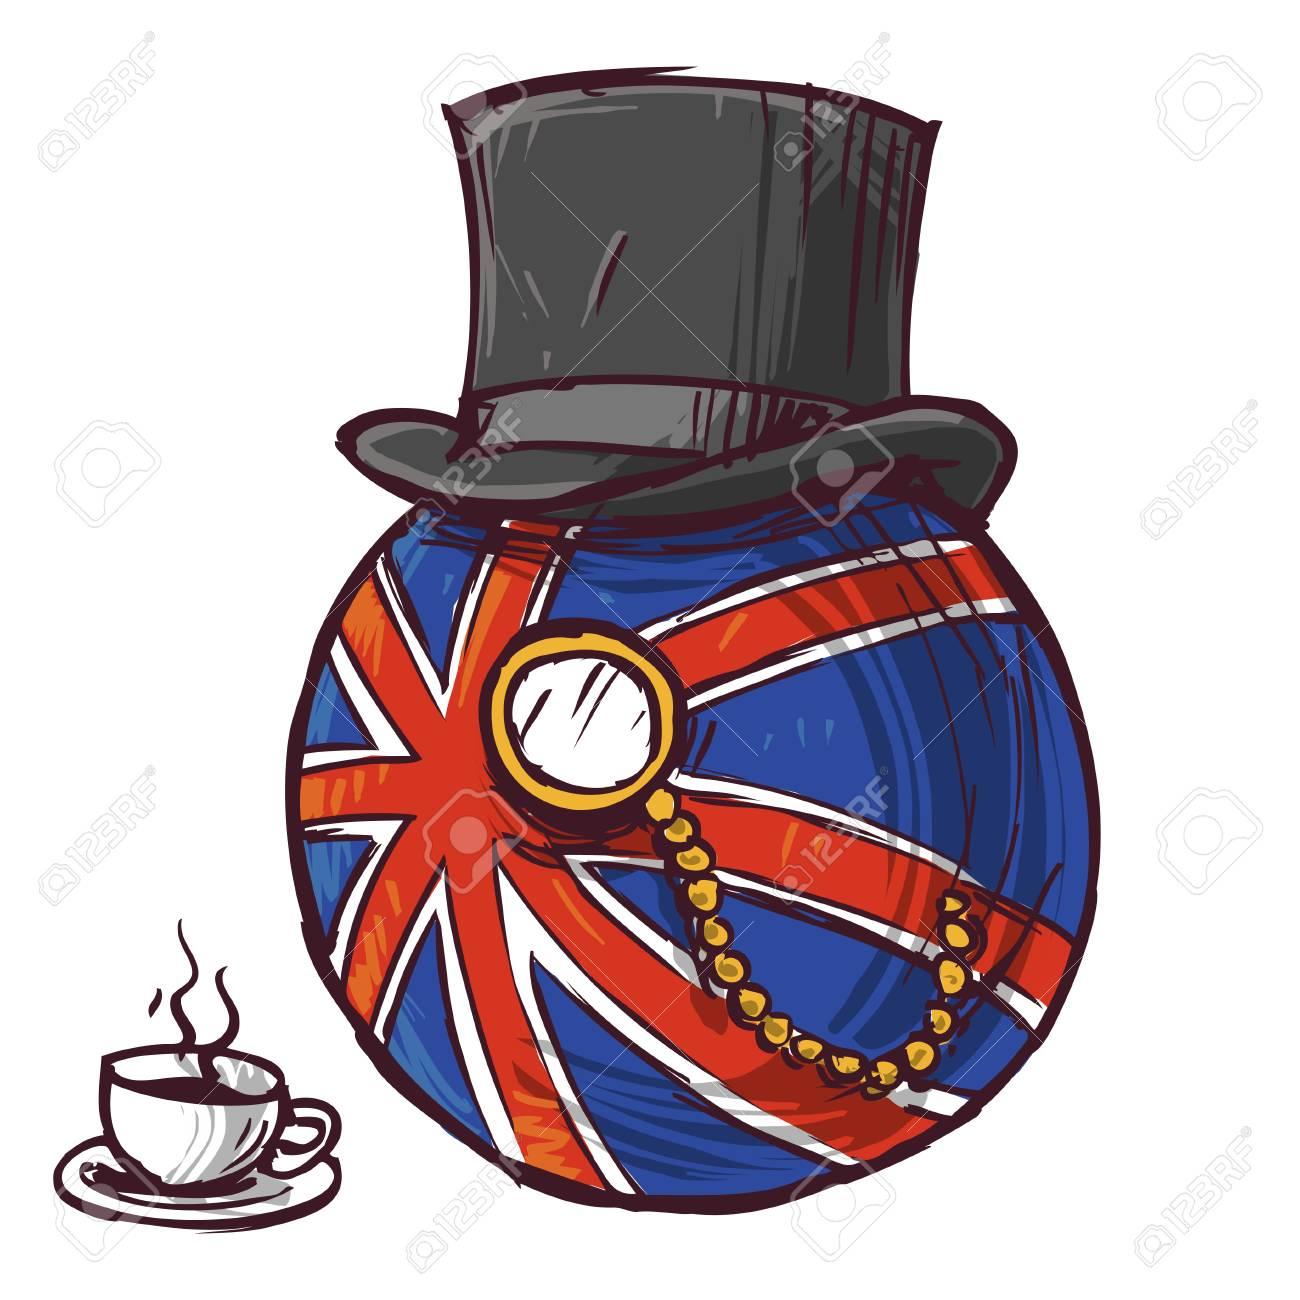 england country ball - 110251503